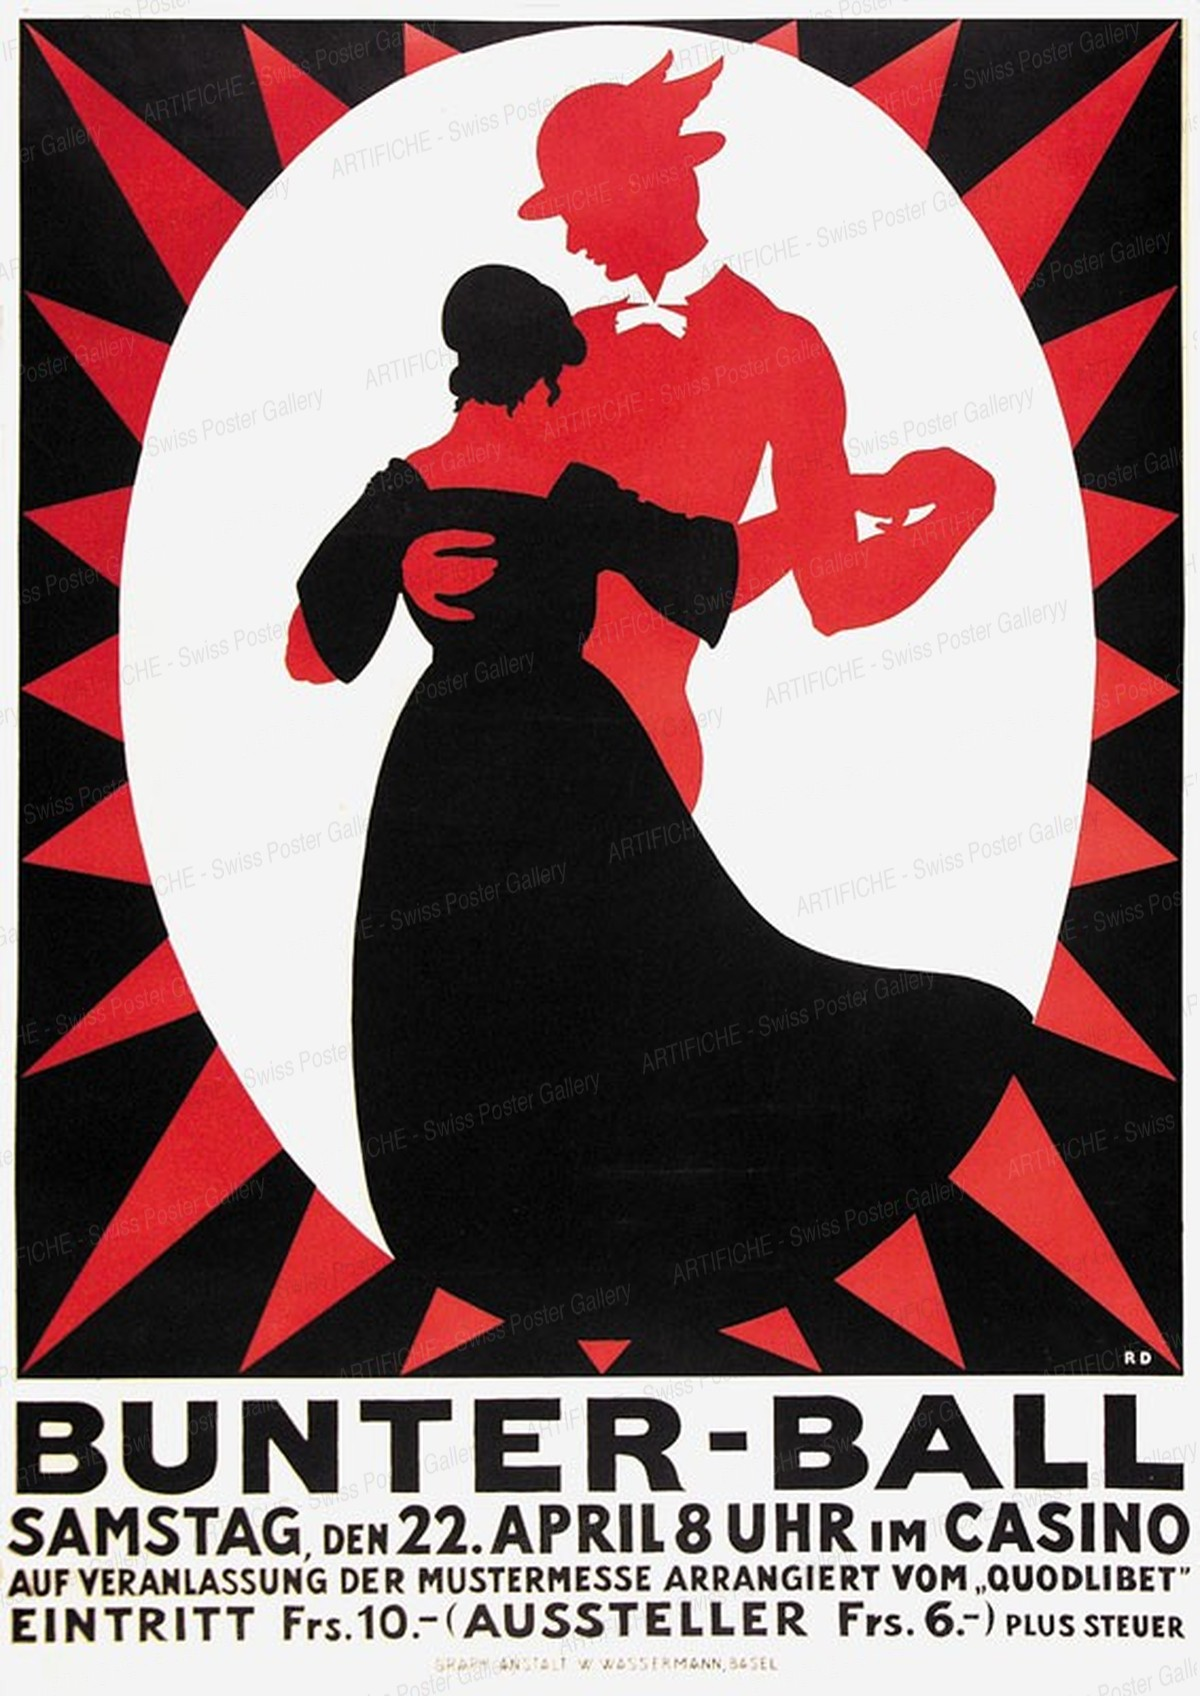 BUNTER BALL – CASINO, Rudolf Dürrwang